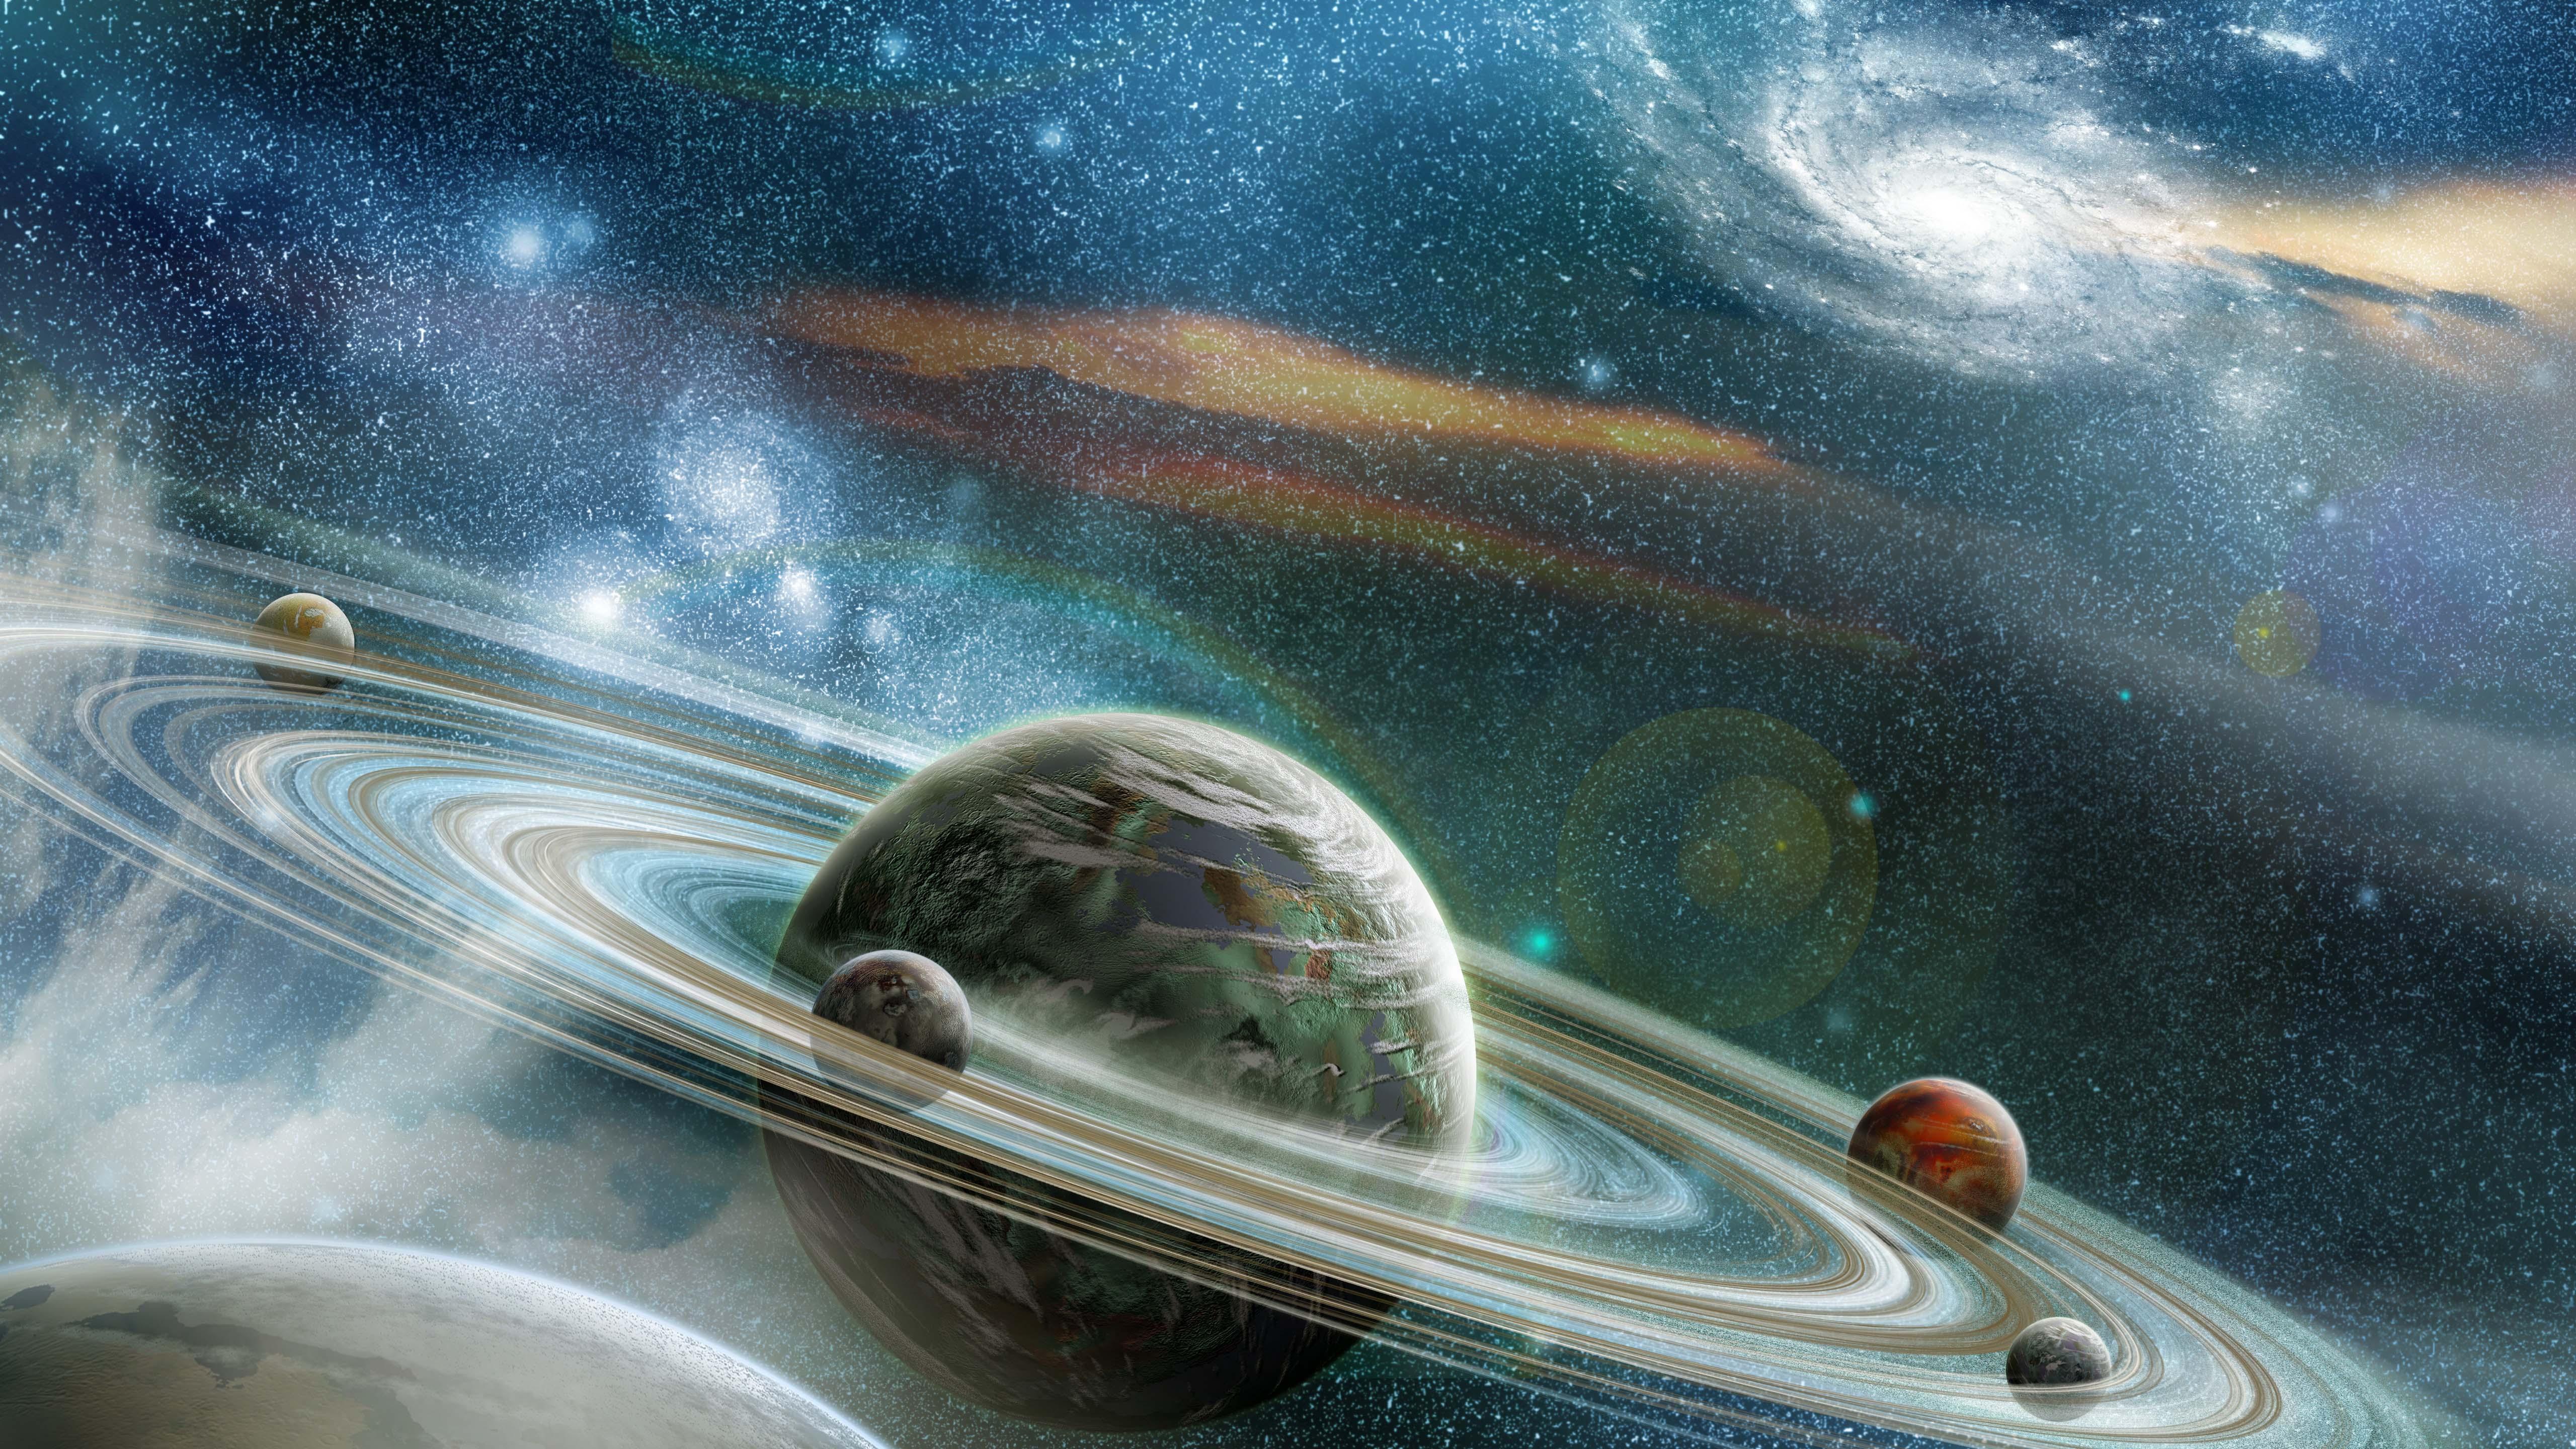 Iphone X Wallpaper Transparent Space Galaxy Planets Stars Space Sci Fi 4k Ultra Hd